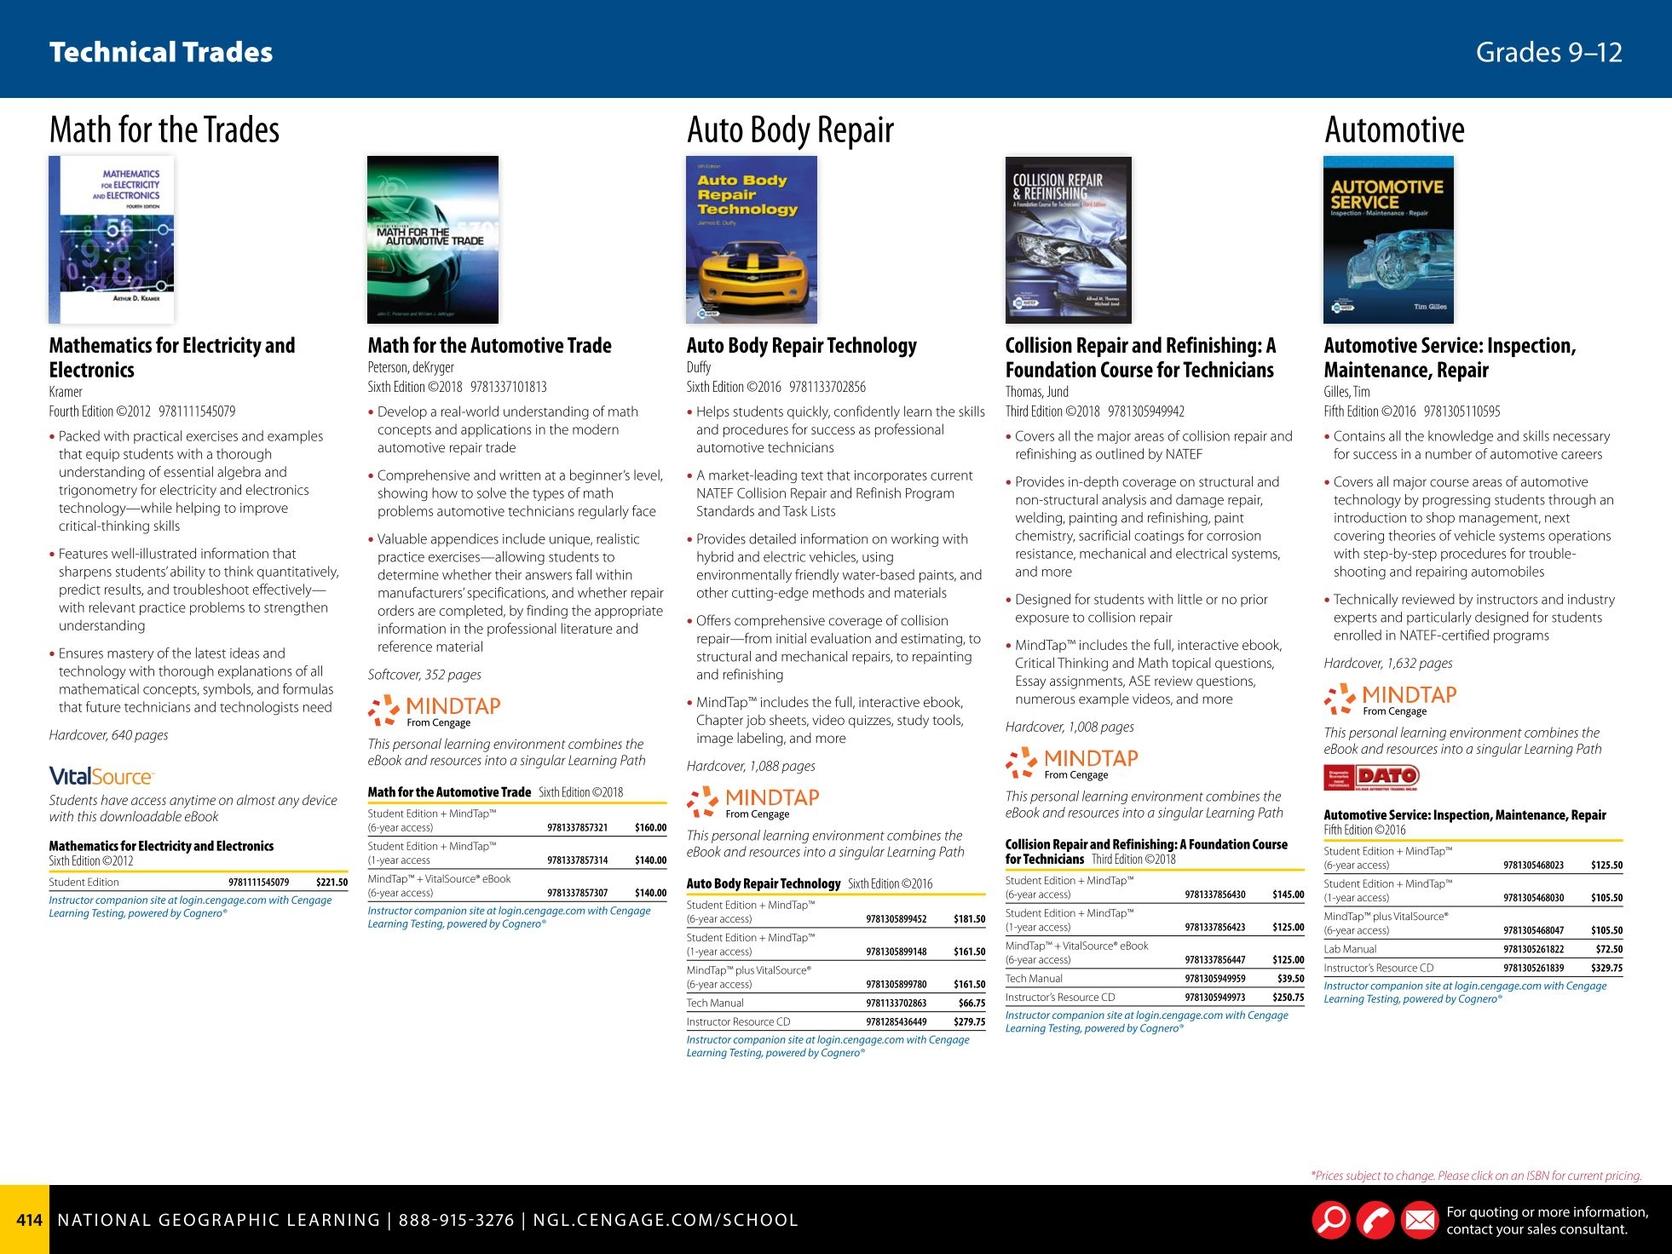 Collision repair estimating manual ebook array grades 9 12 2017 2018 career and technical education catalog rh nxtbook fandeluxe Gallery